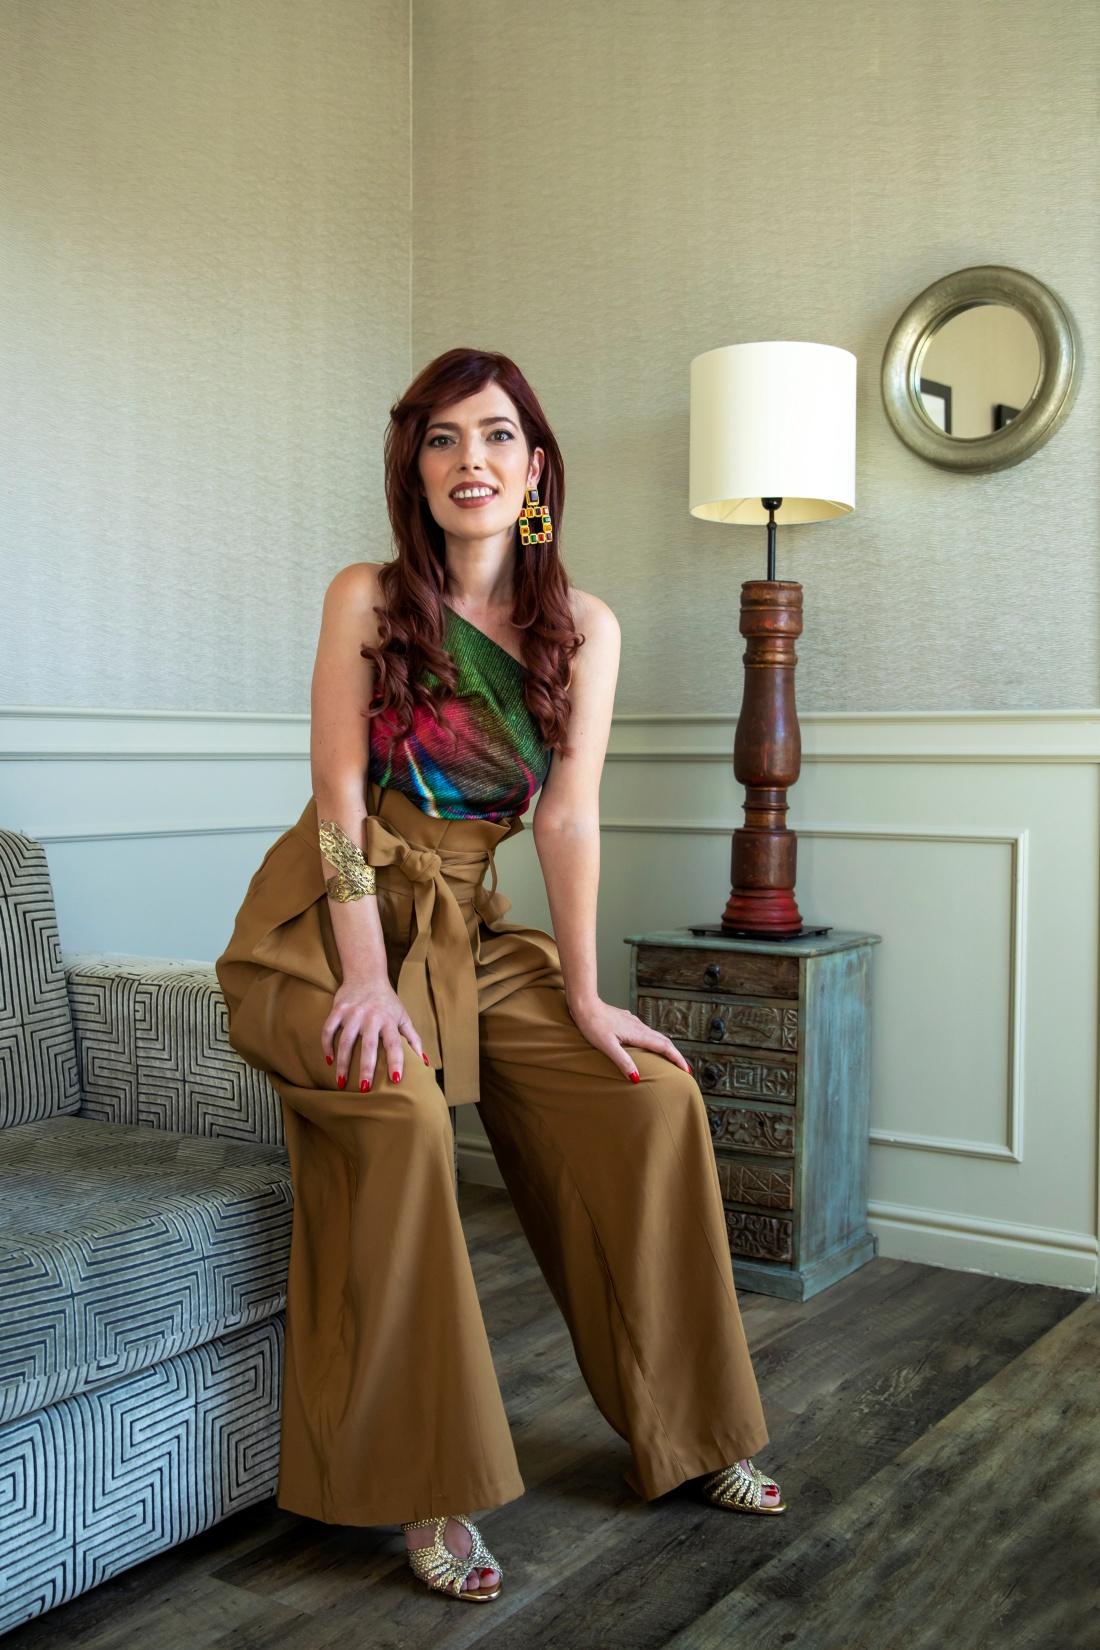 Entrevista a Mercè Bona, Tiktoker La Chica Bona